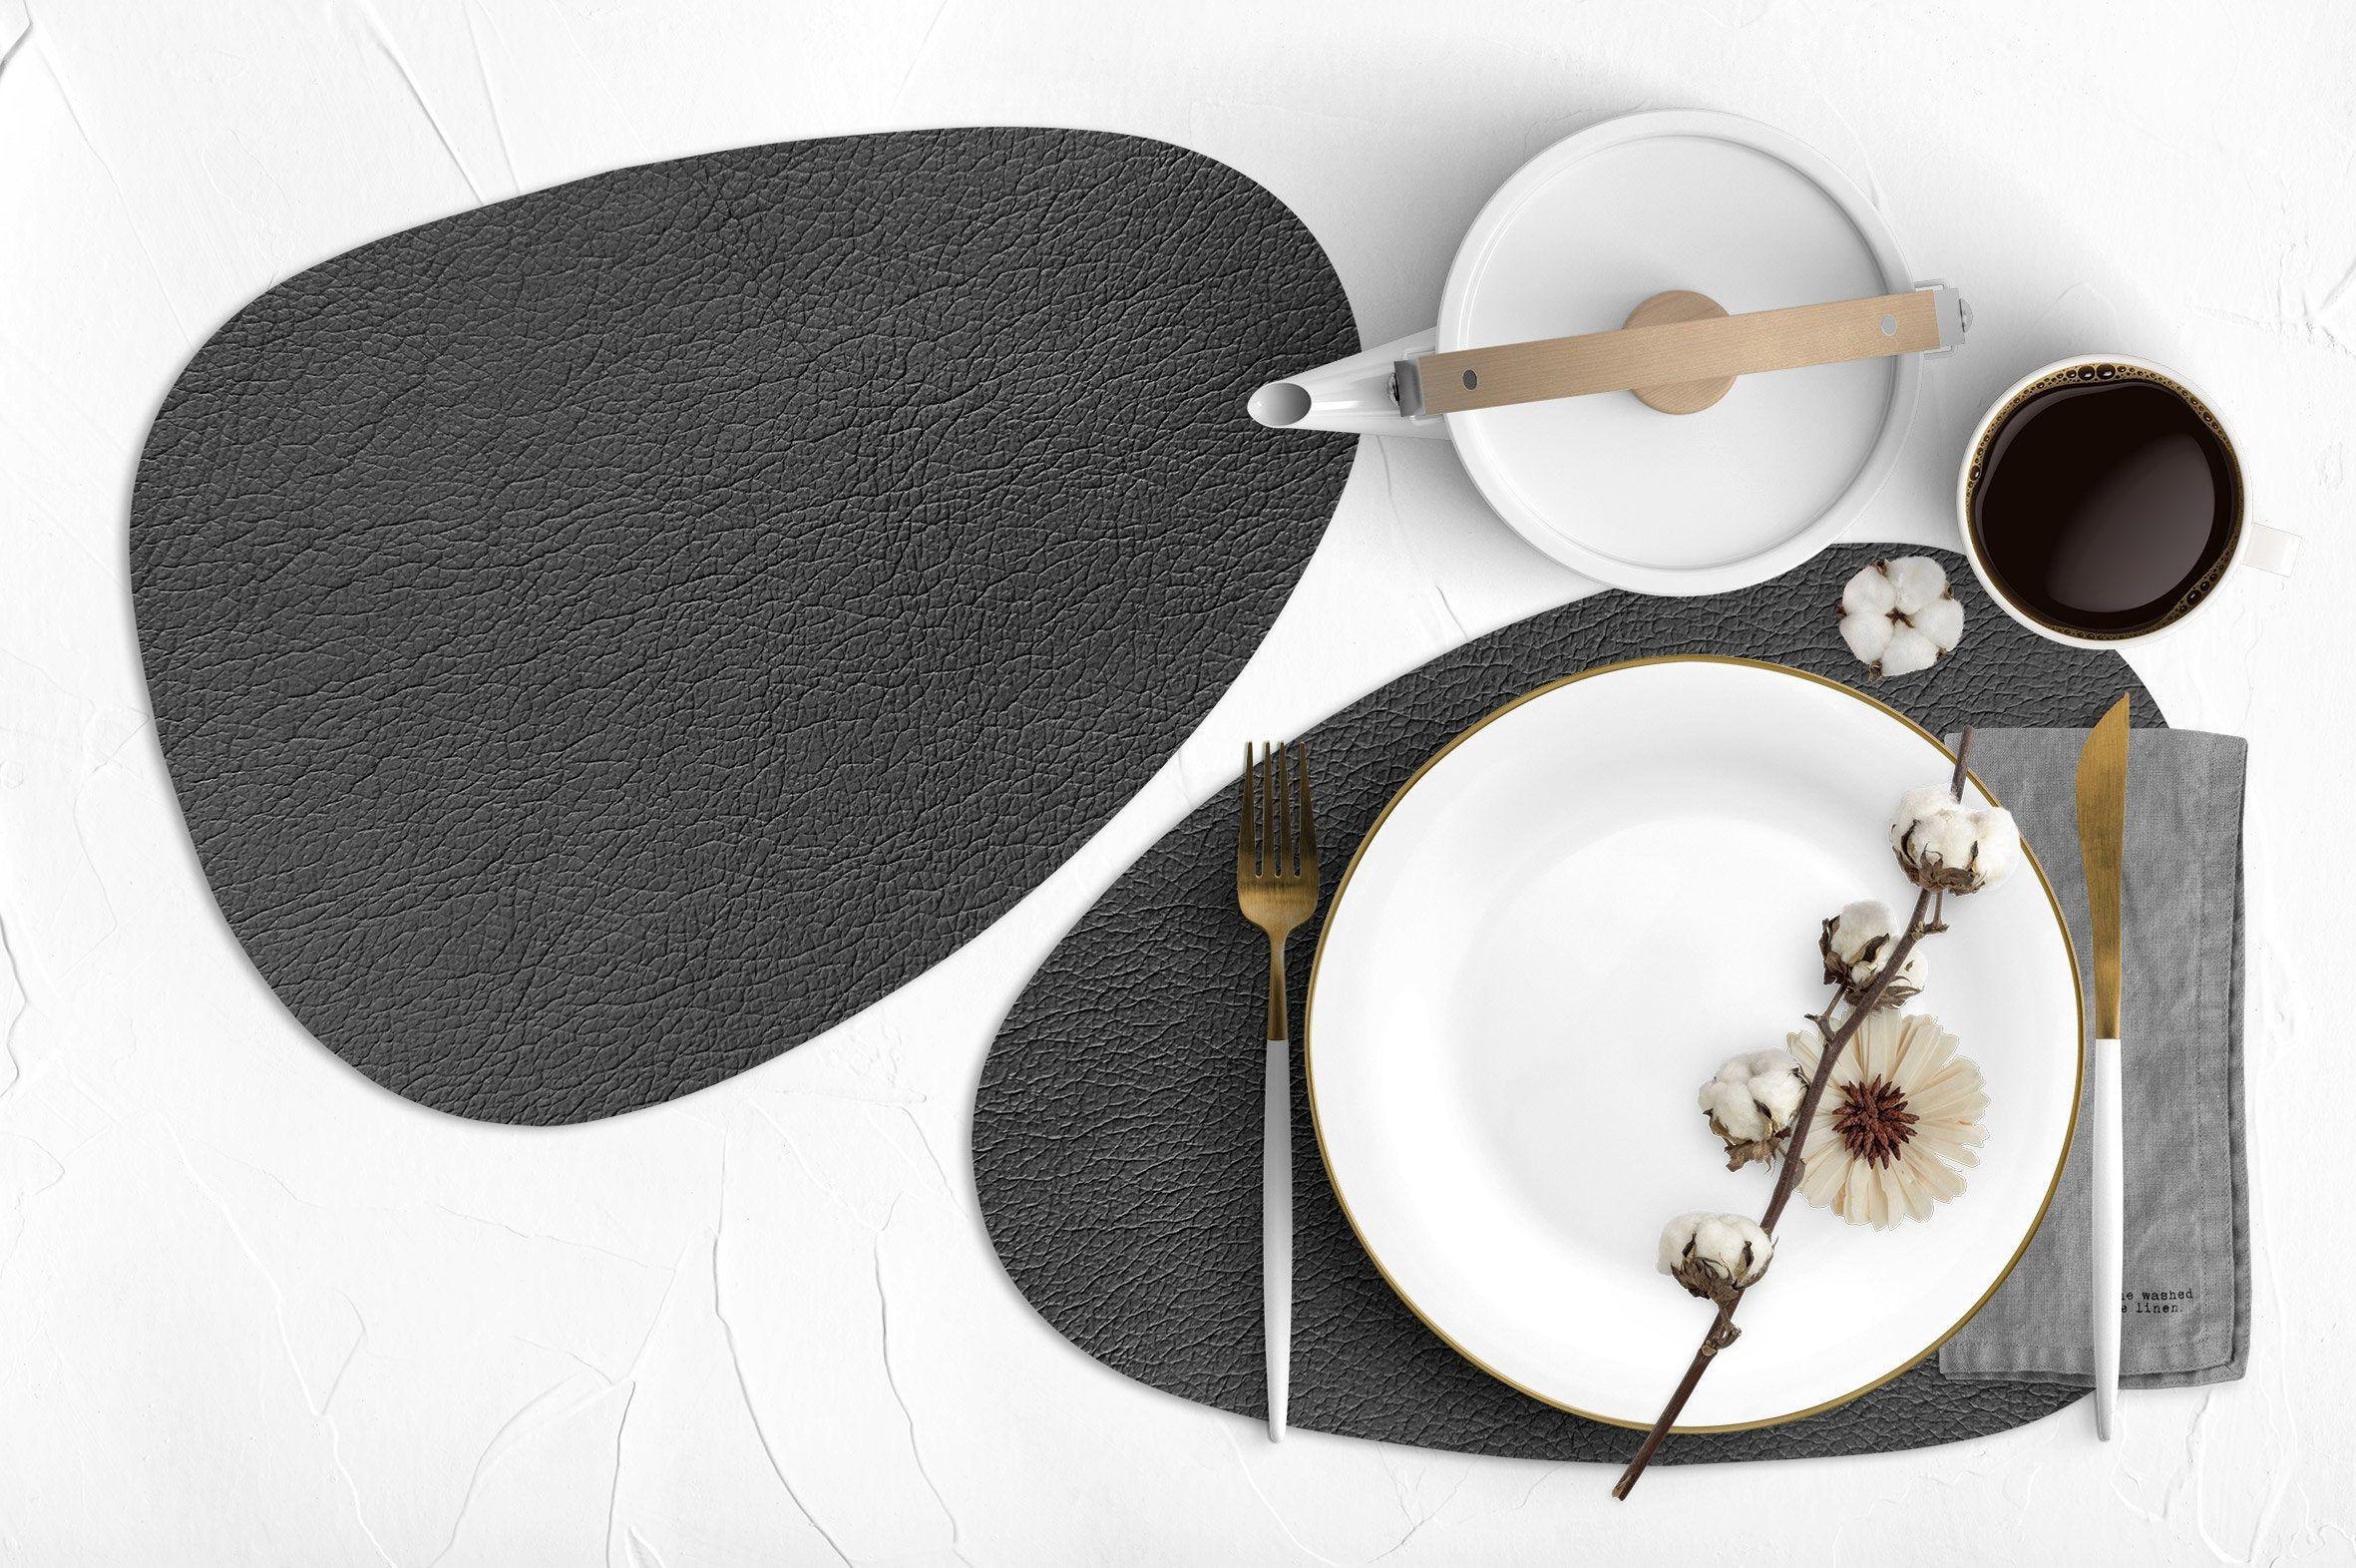 Grey Vinyl Curve Oval Heat Resistant Placemats Faux Leather Leather Like Prestigious Tableware Dinnerware Dining Setting Decor Tableware Design Handmade Tableware Tableware